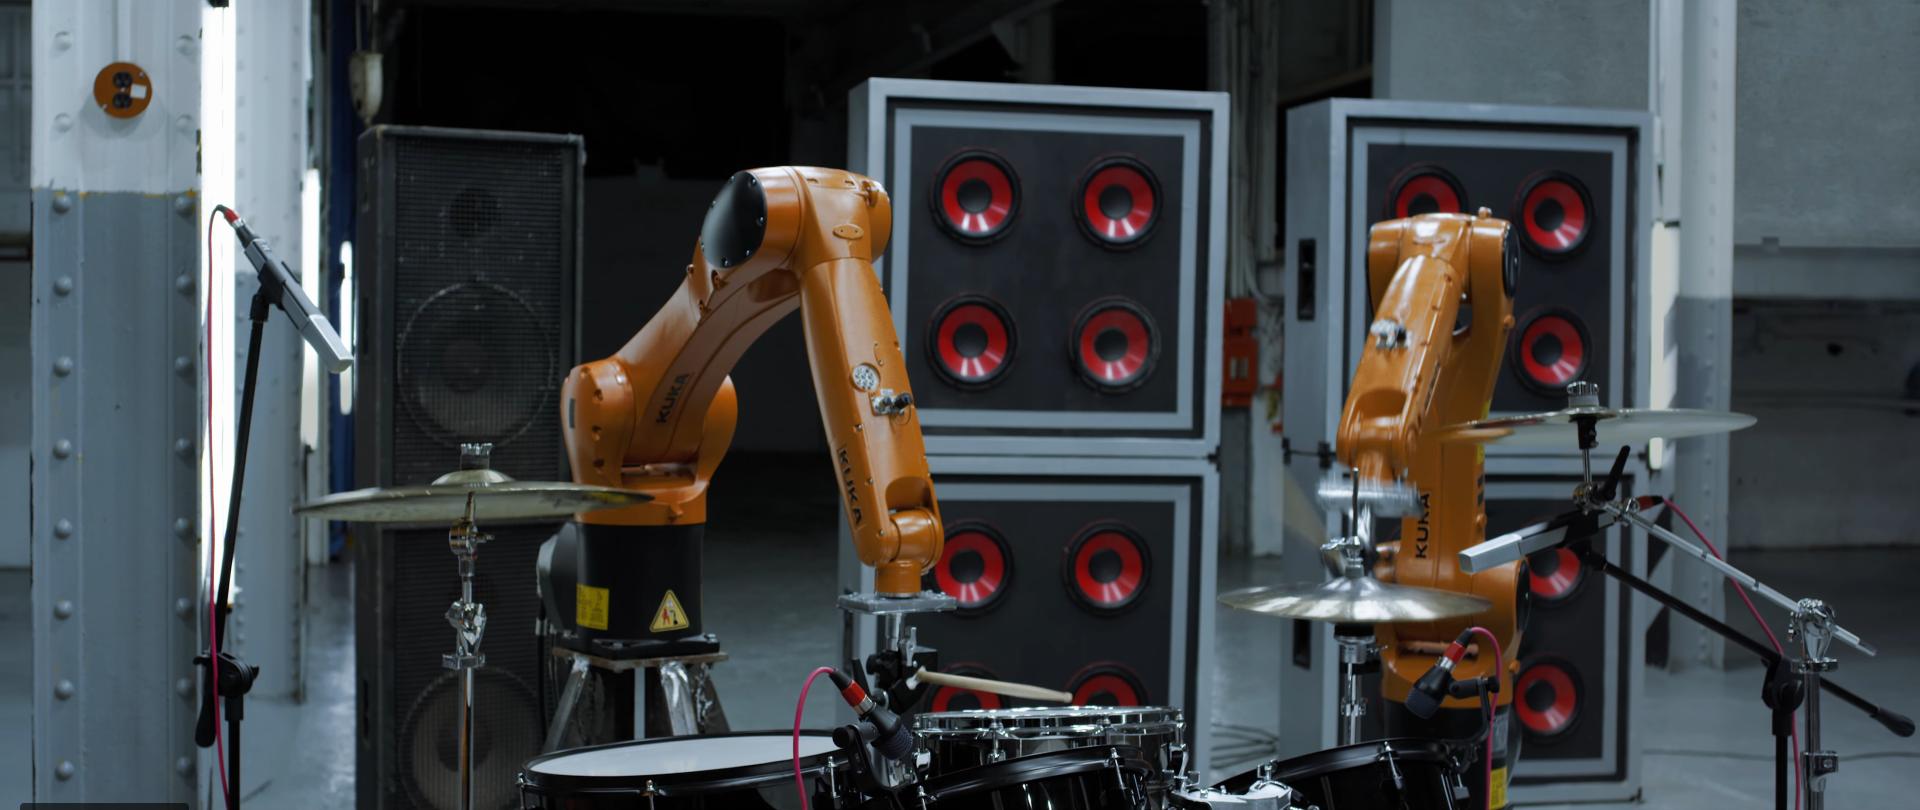 AUTOMATICA. Robots Vs. Music por Nigel Stanford